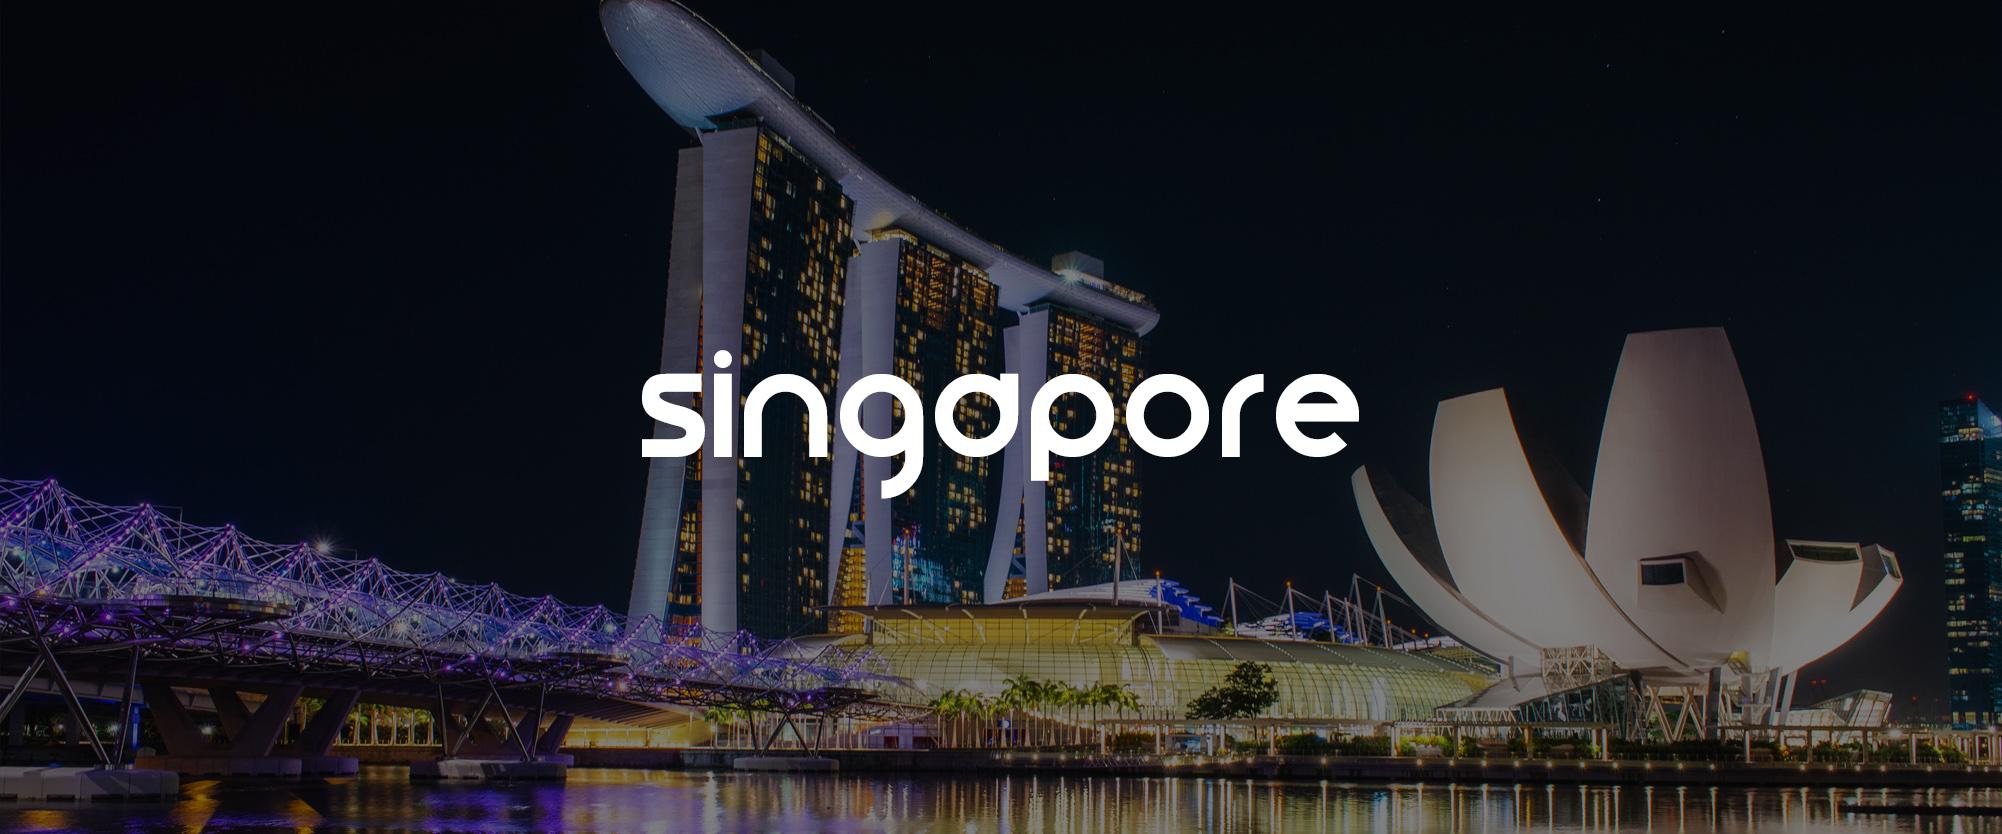 singapore header.jpg